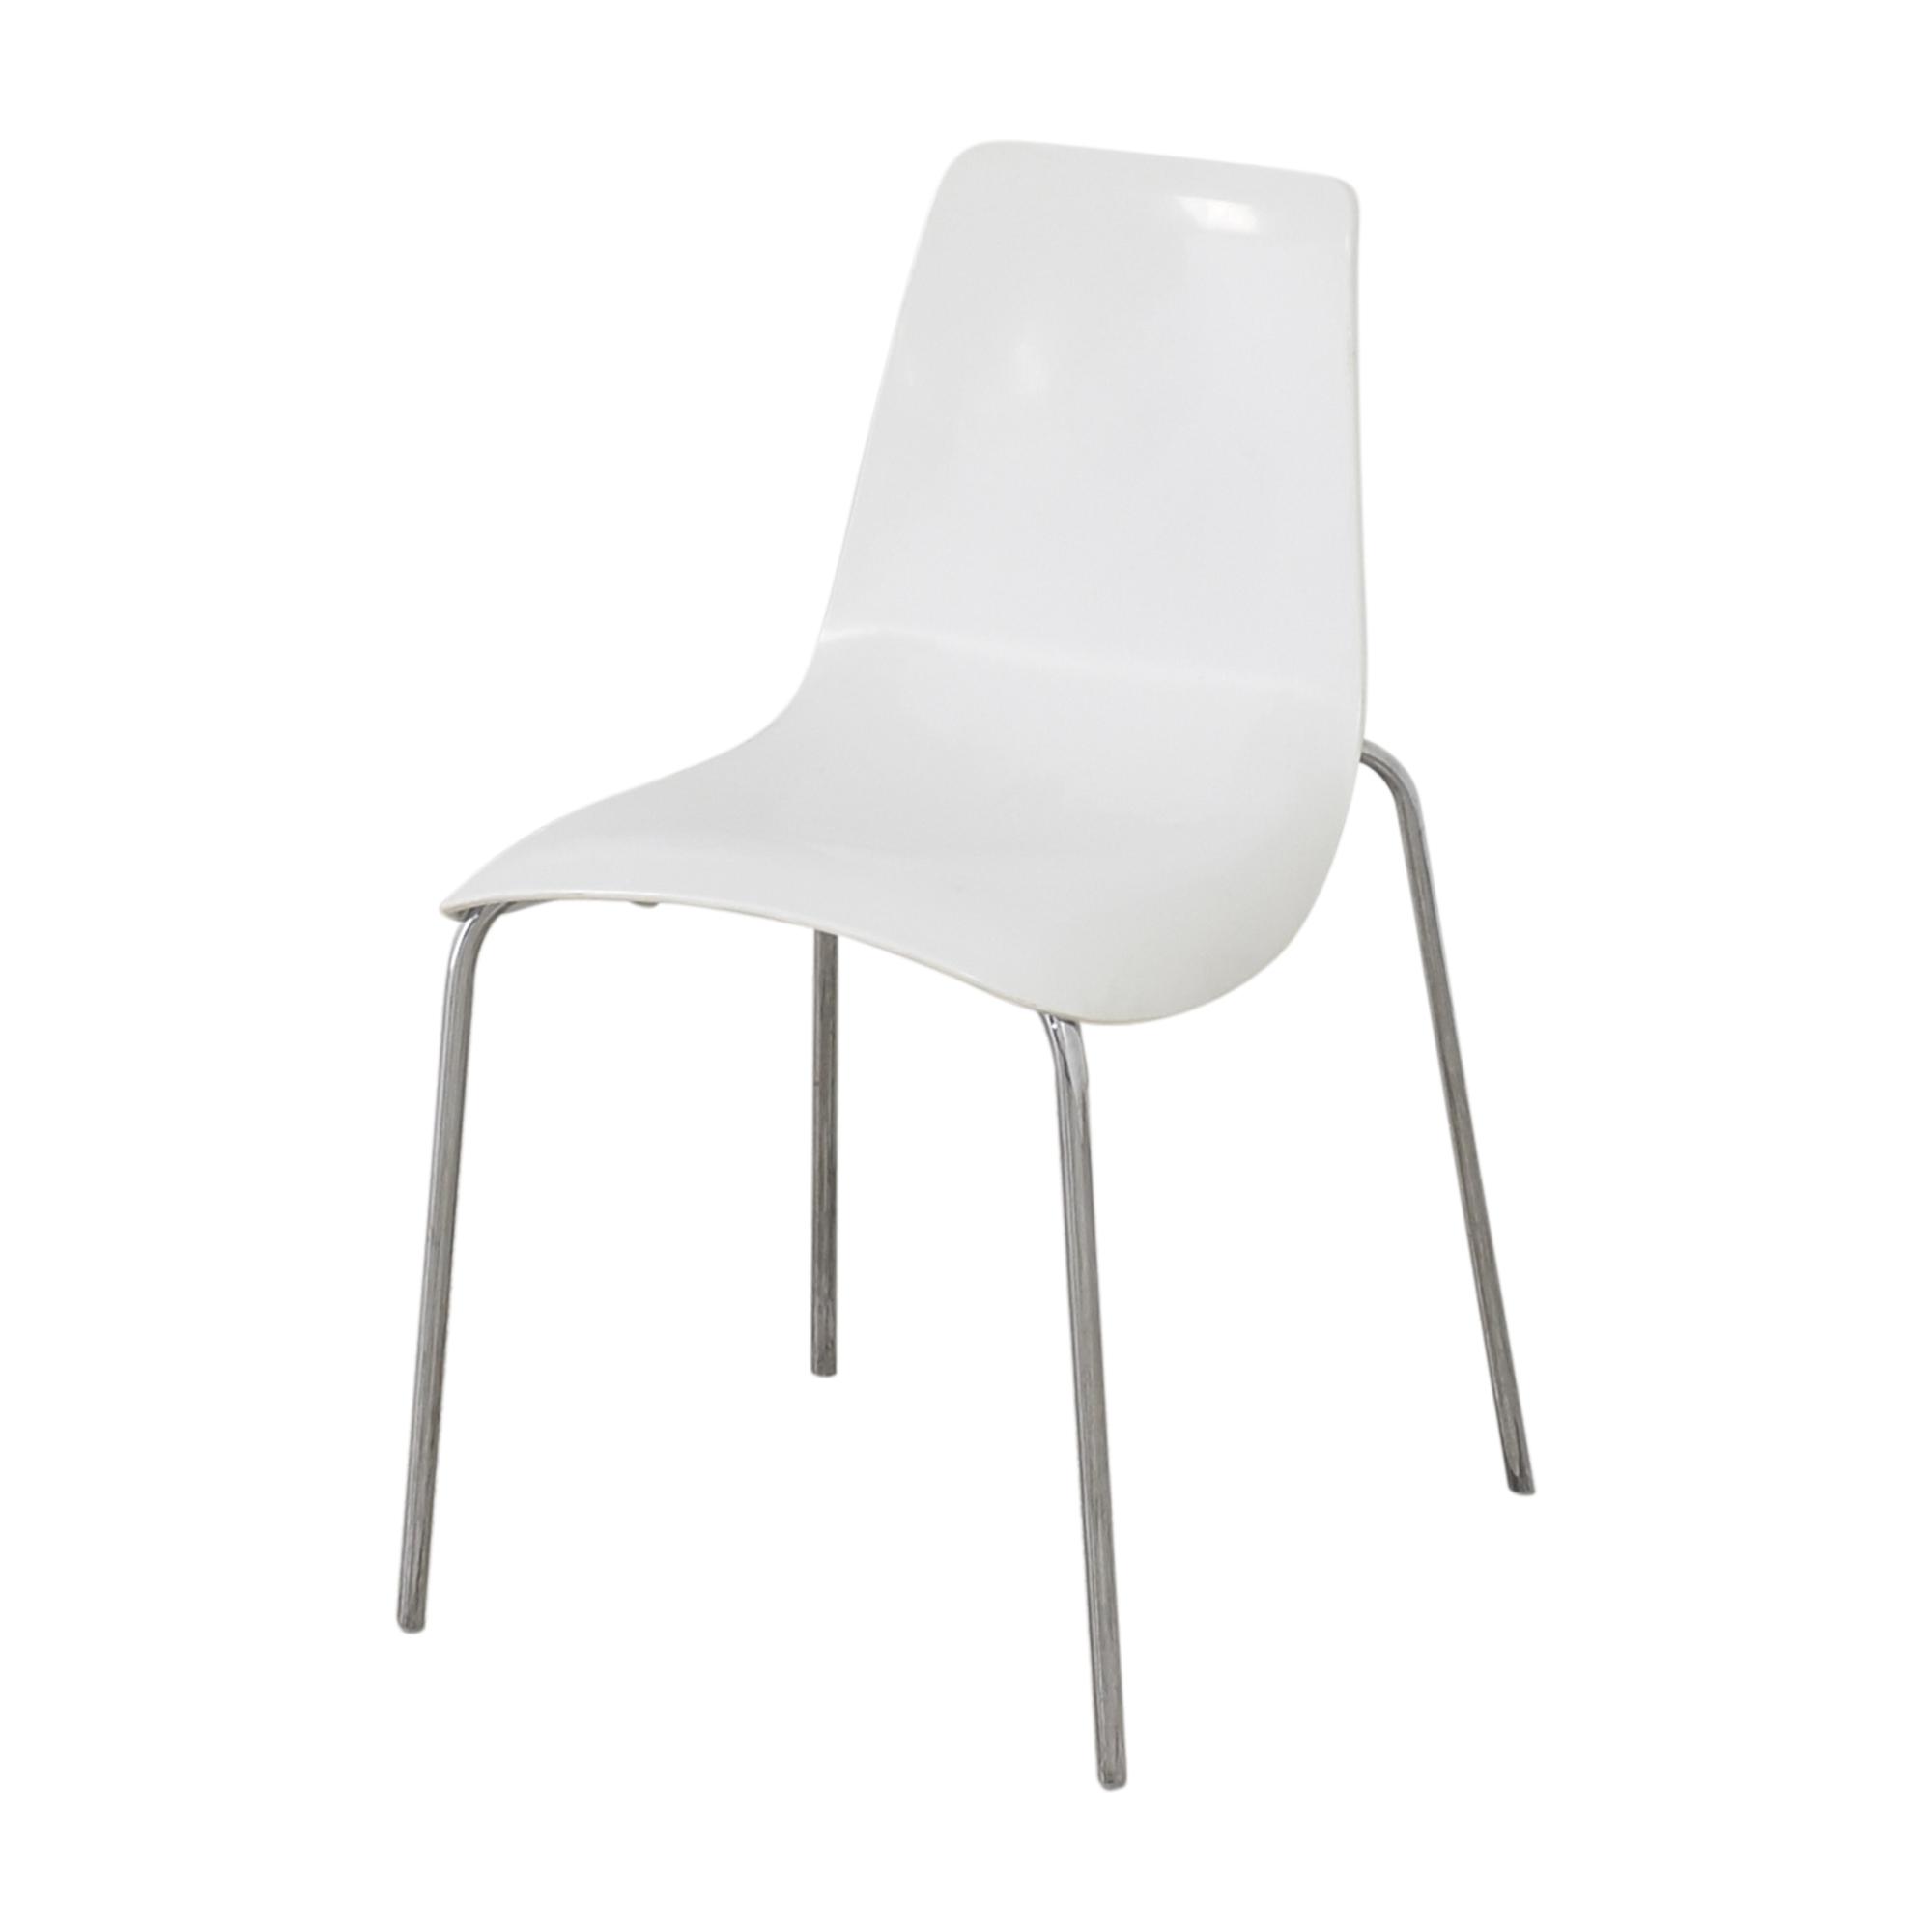 Bonaldo Bonaldo Lei Stackable Chairs second hand